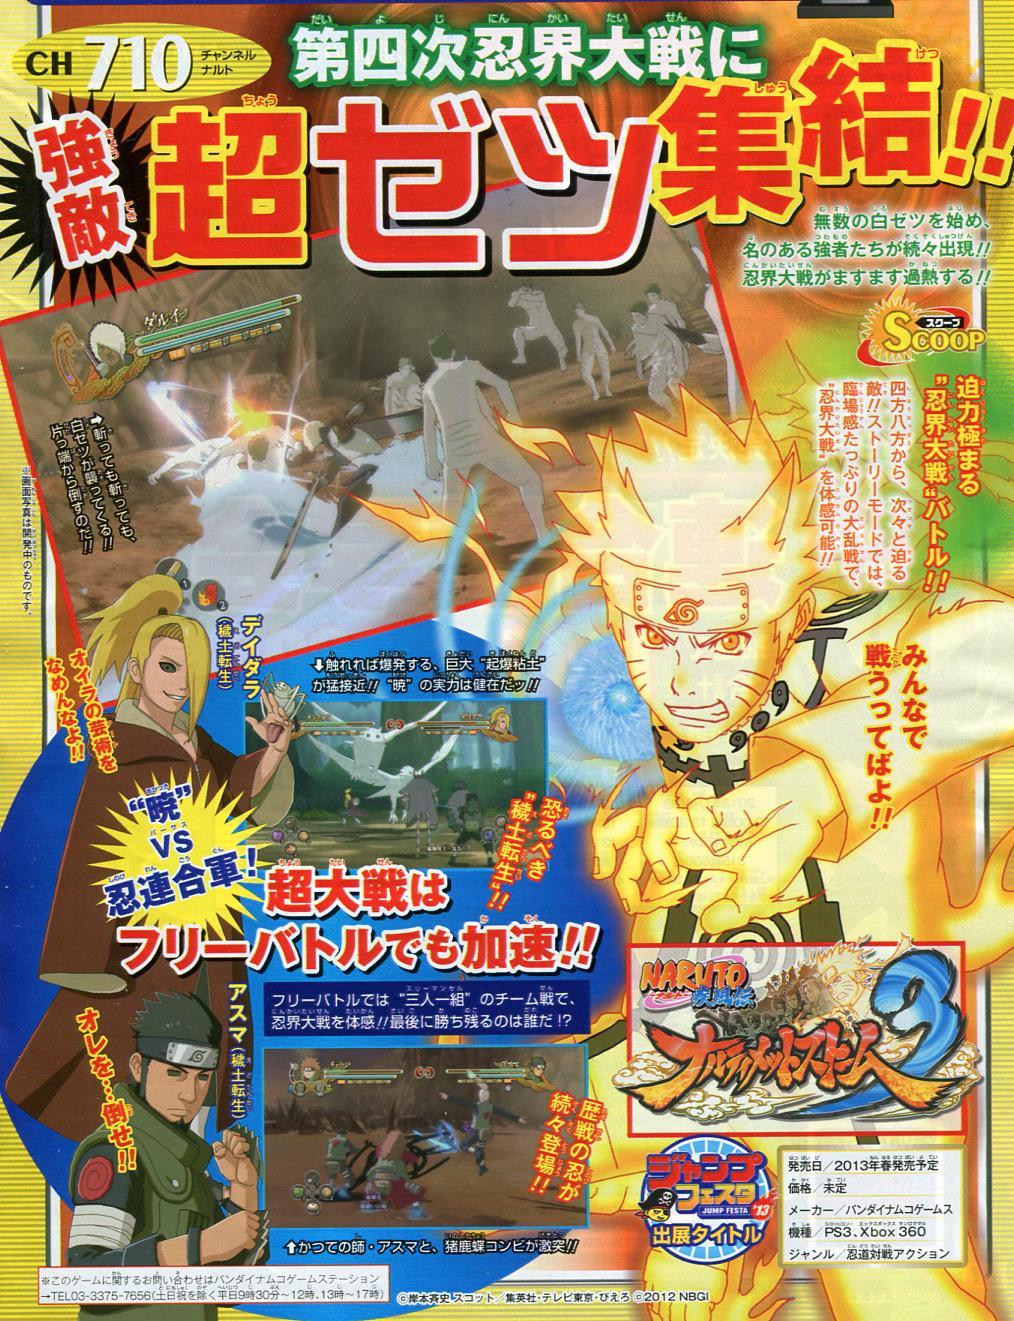 http://www.game-saga.com/wp-content/uploads/2018/12/naruto-shippuden-ultimate-ninja-storm-3-scan-1.jpg